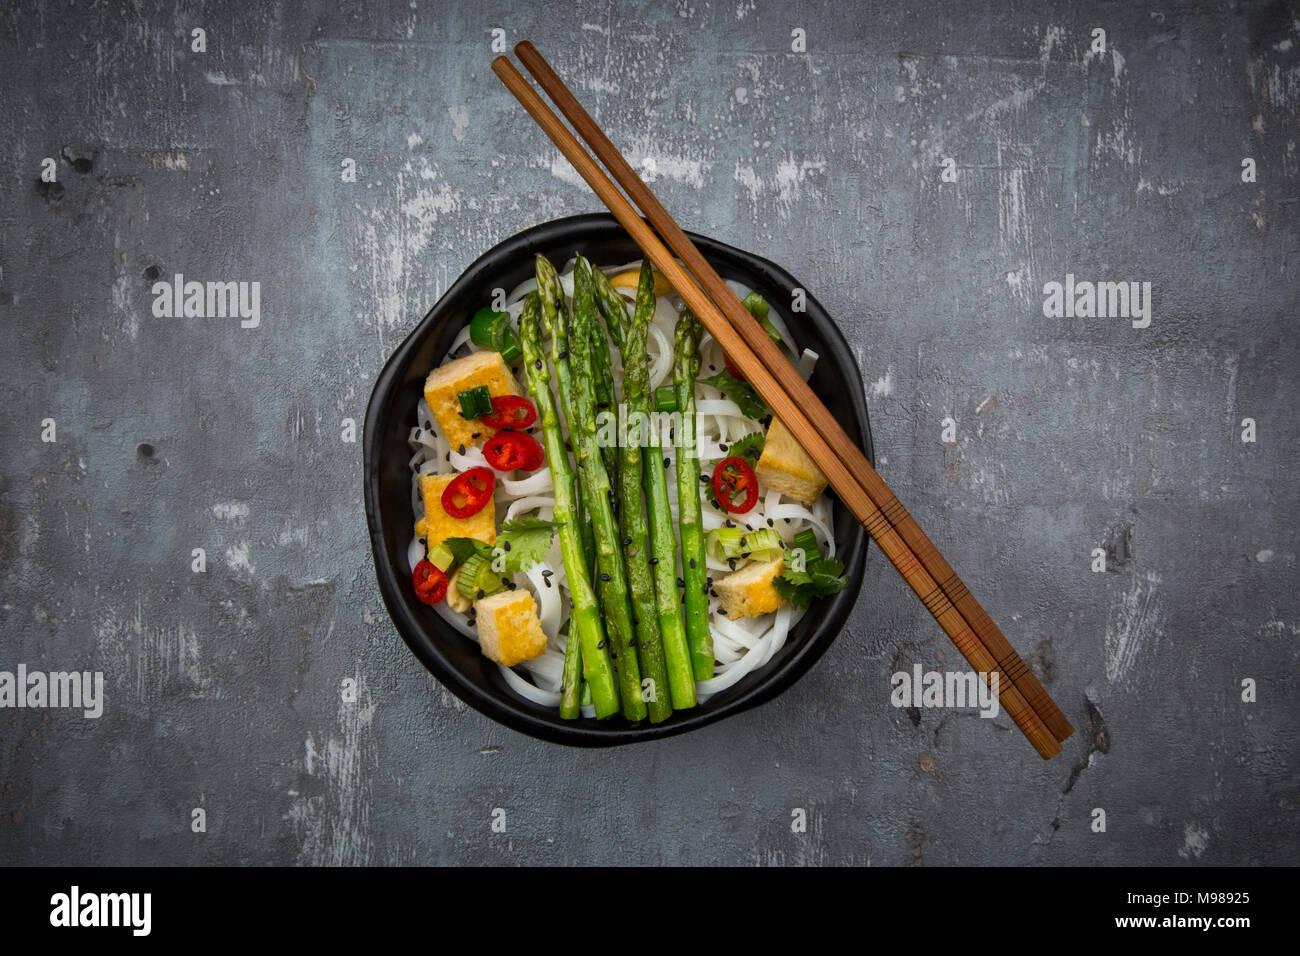 Bowl of vegan Pad Thai with mini green asparagus and tofu, chili, spring onion, peanut and coriander - Stock Image